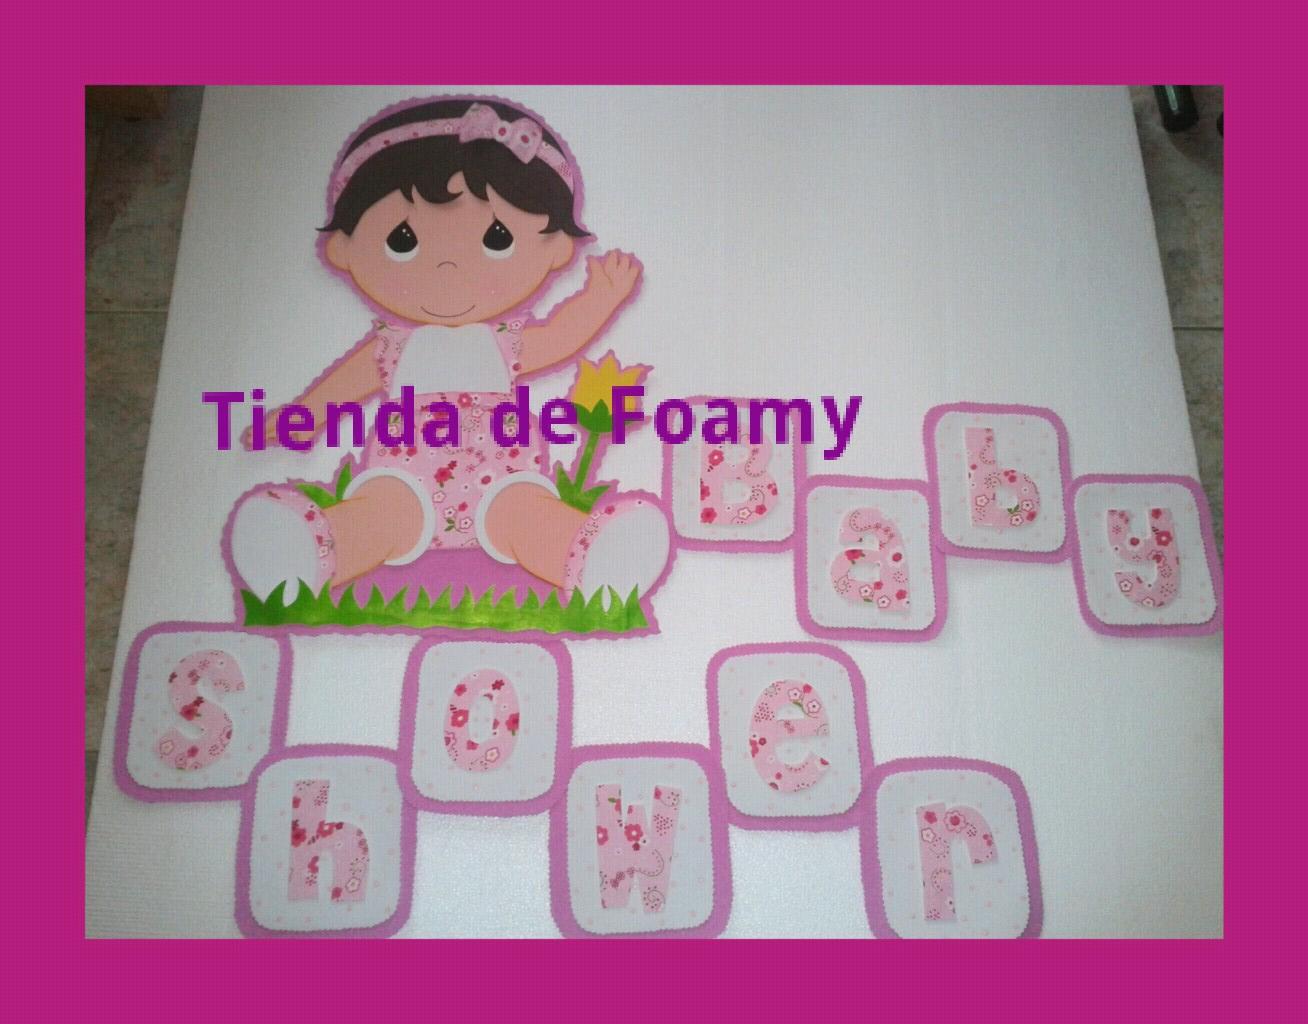 TIENDA DE FOAMY